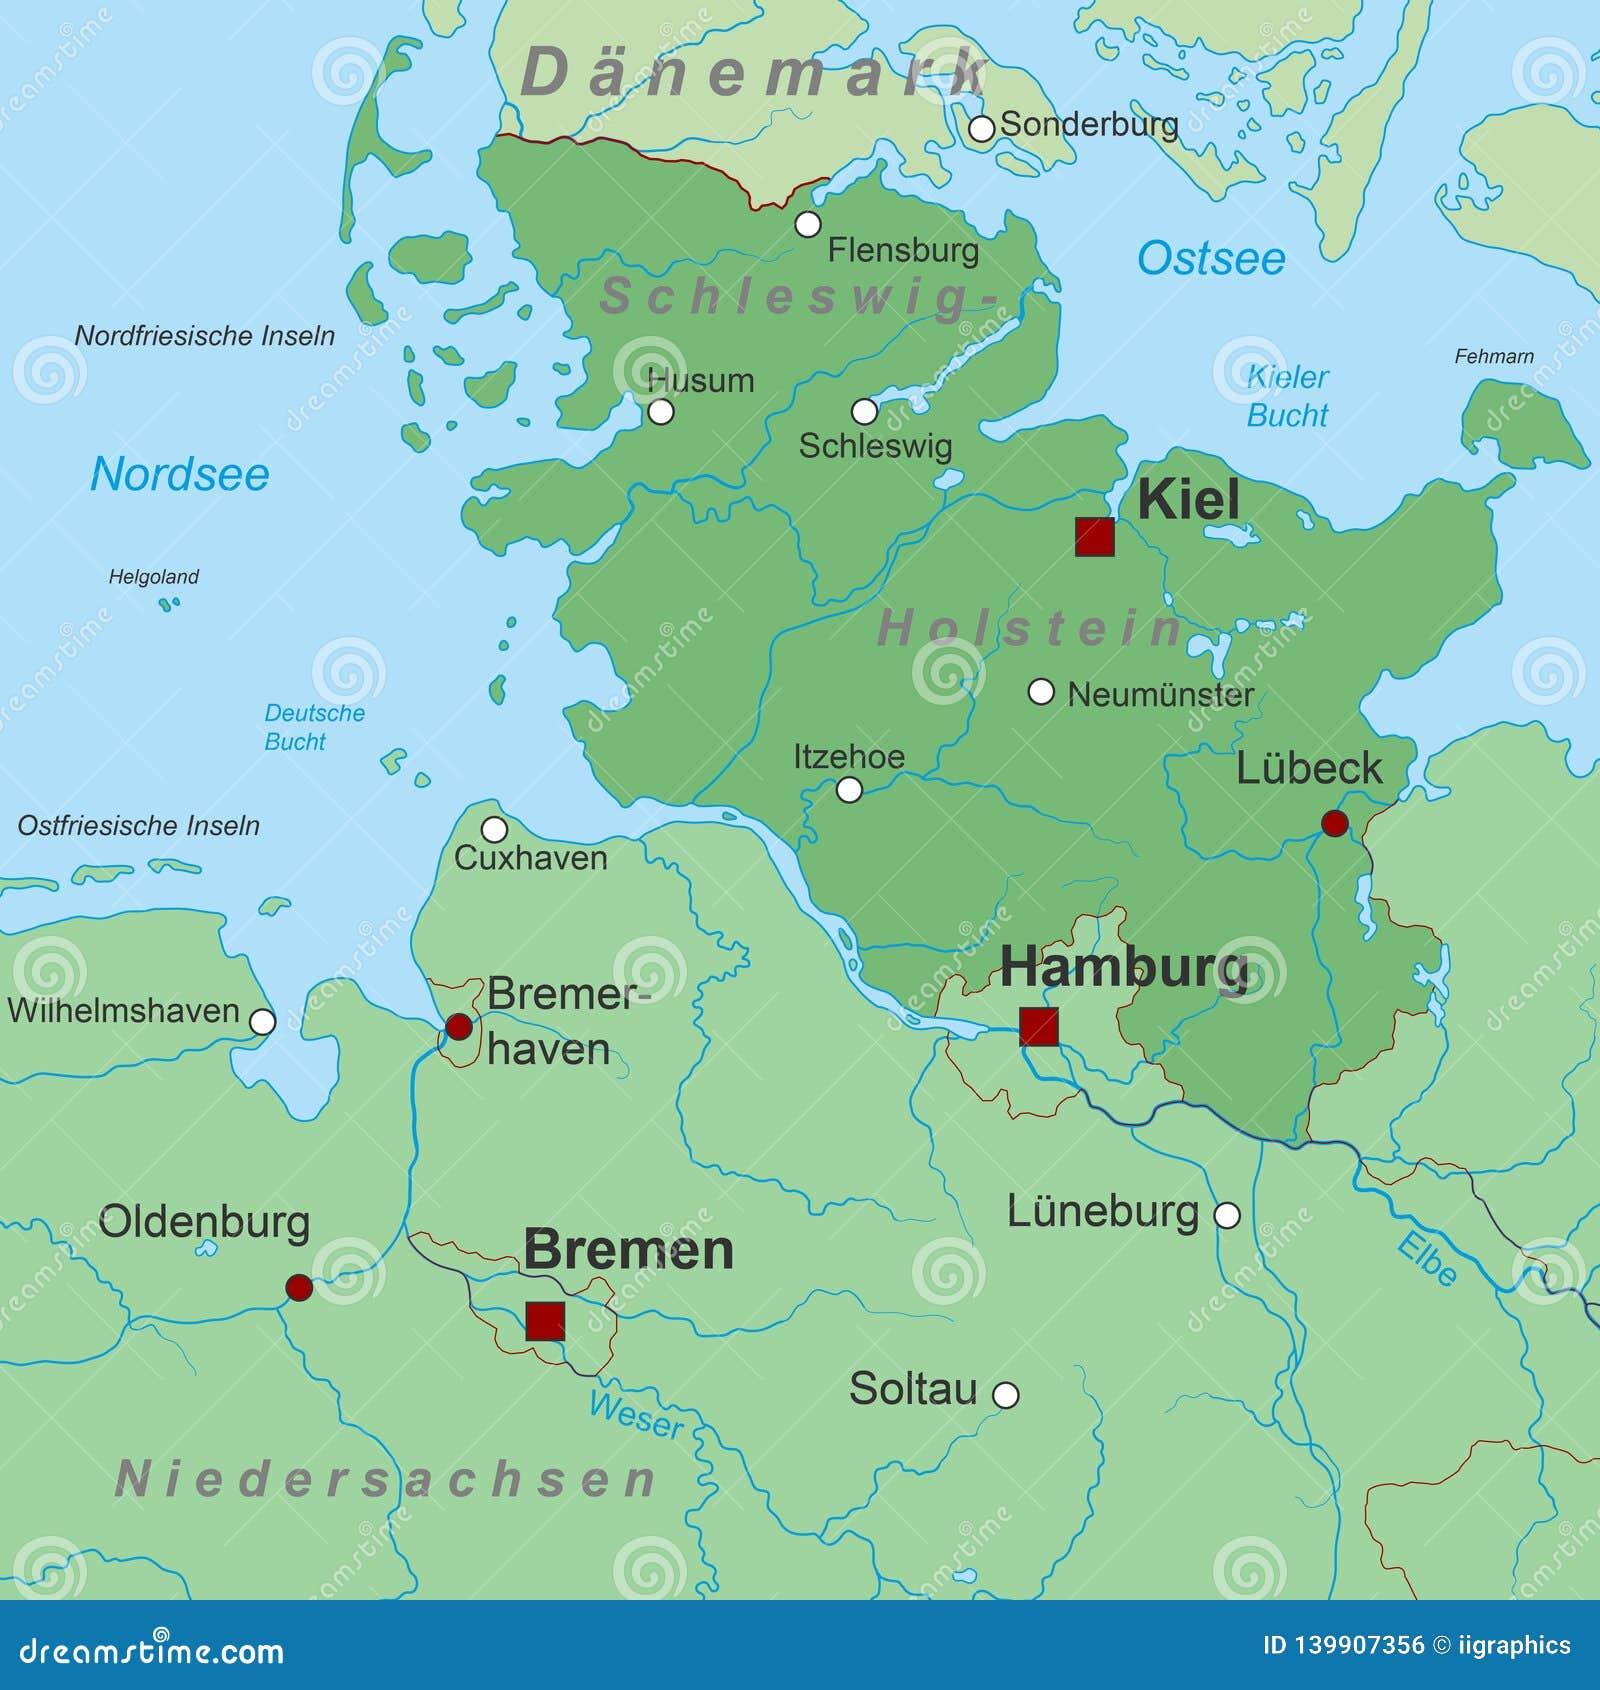 Germany Map Of Germany Schleswig Holstein High Detailed Stock Vector Illustration Of Frankfurt Inscription 139907356